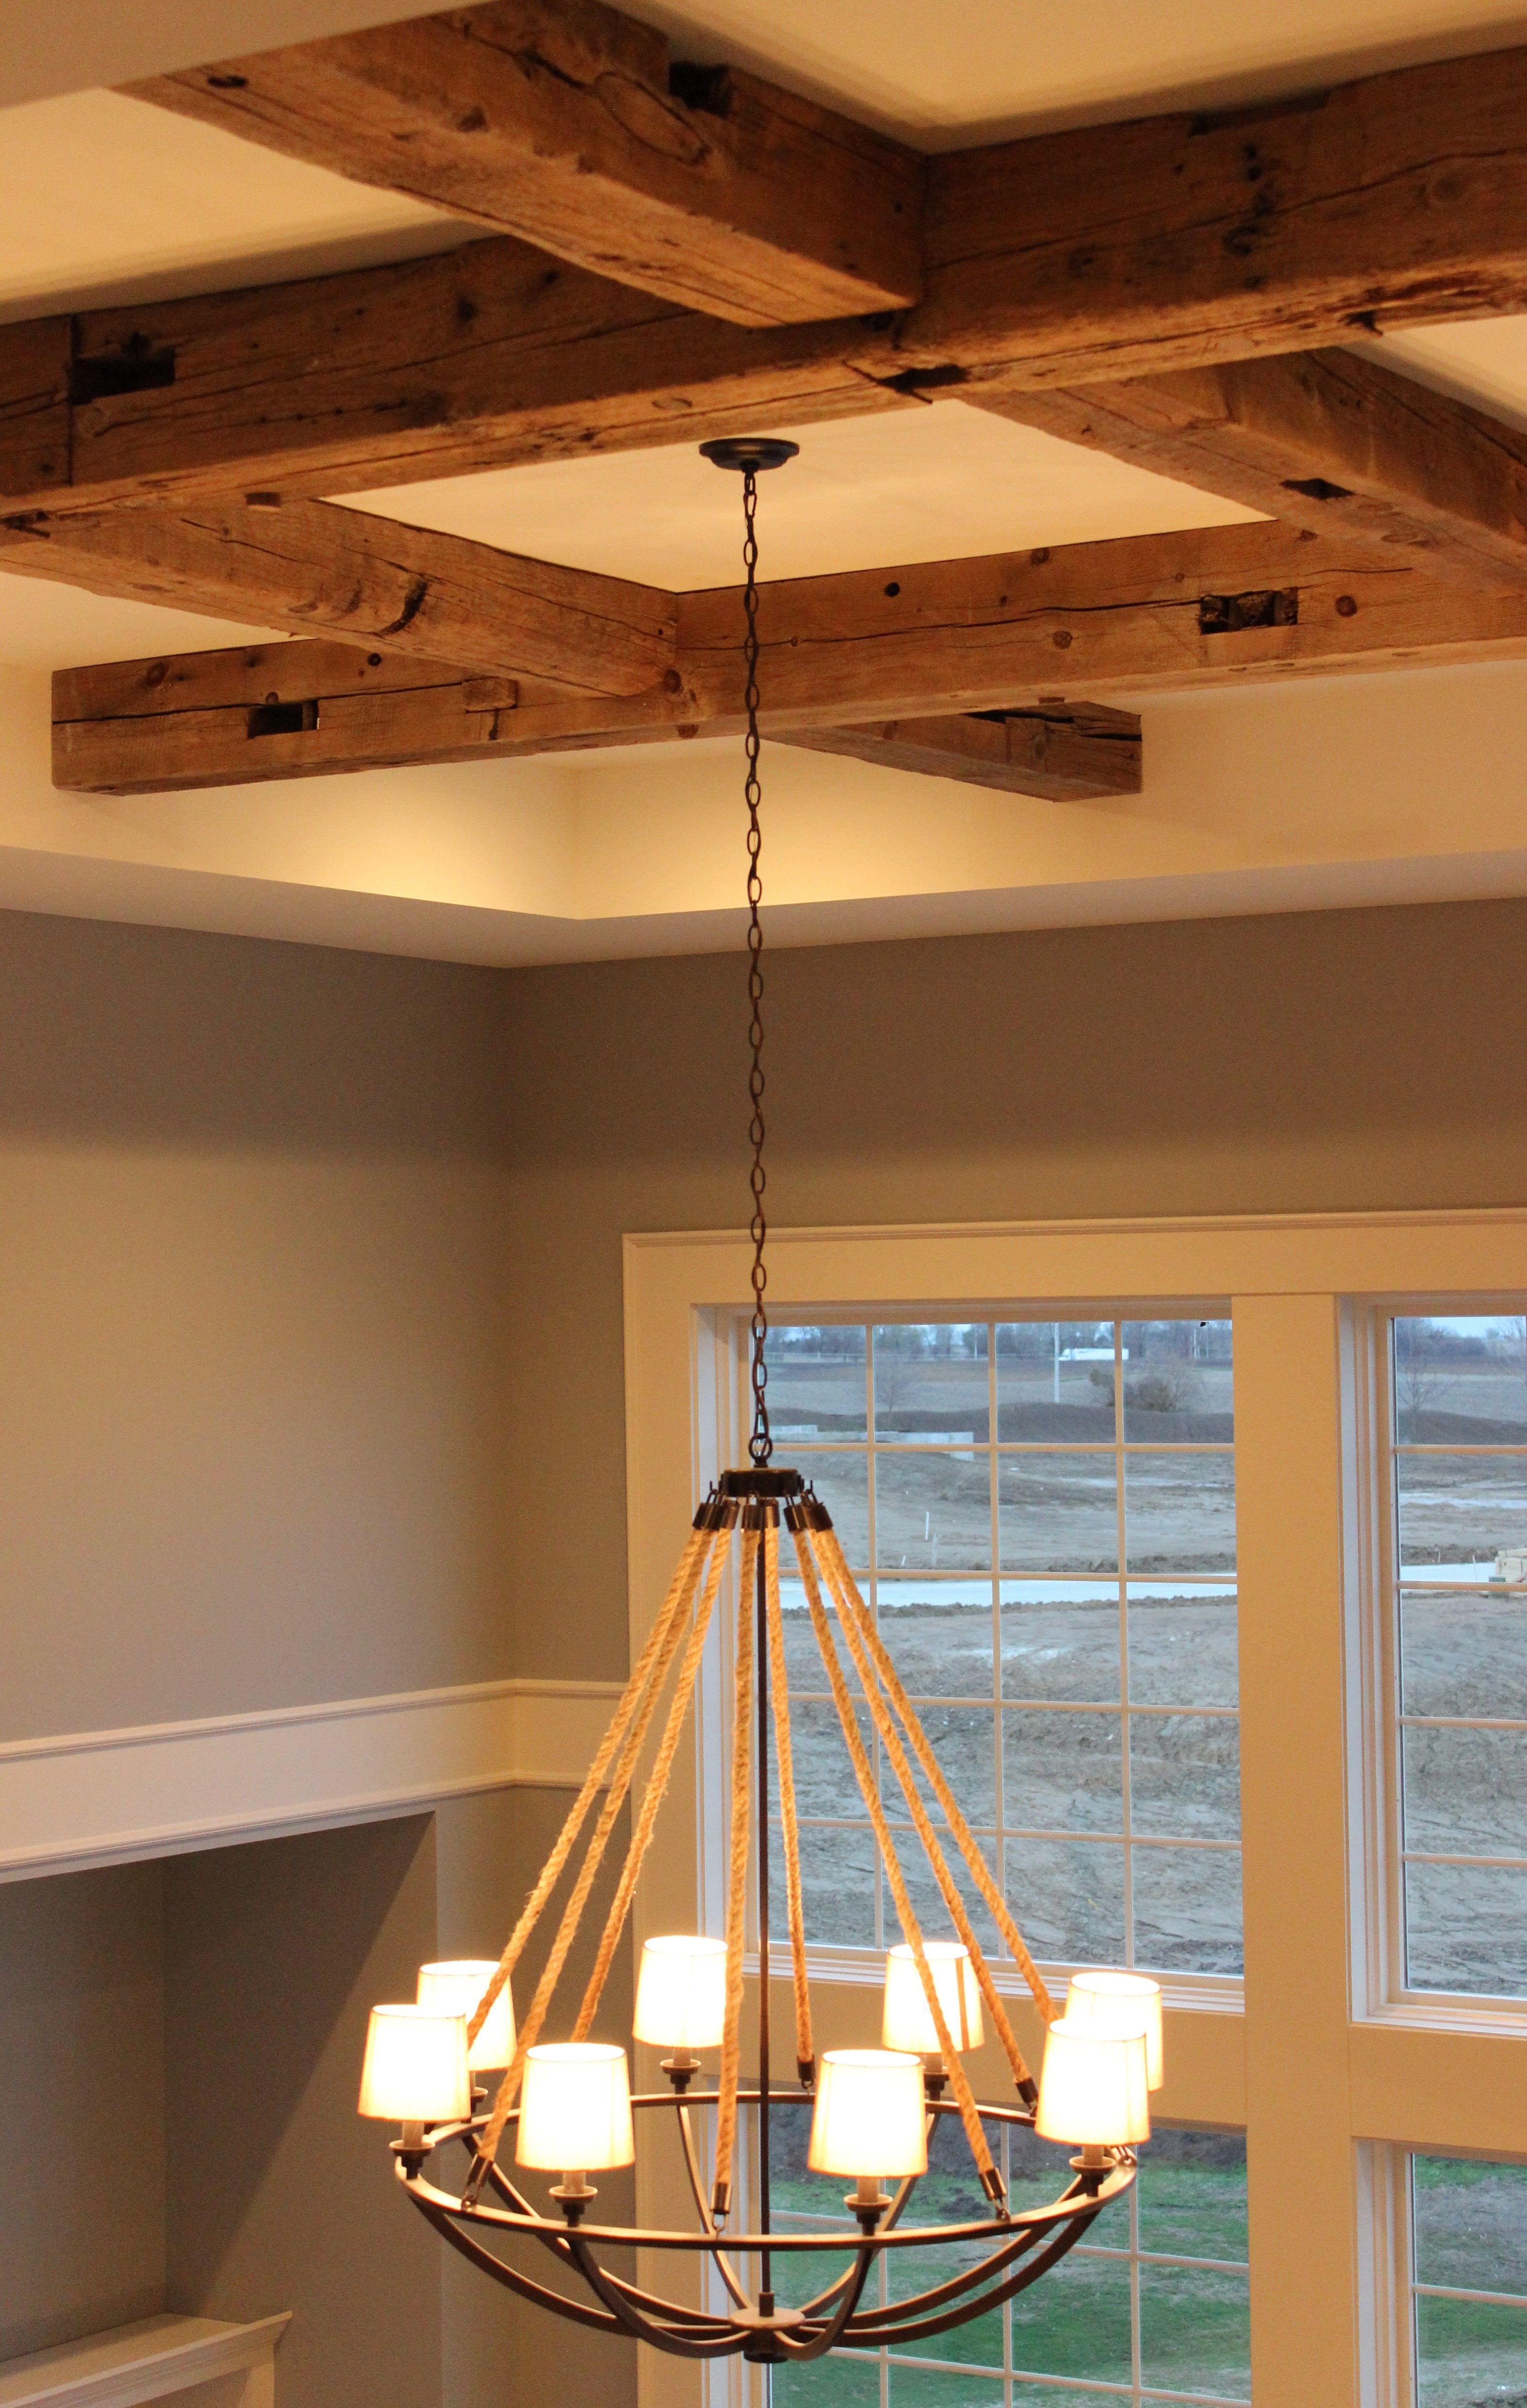 Beautiful Natural Rope Chandelier By ELK Lighting Hangs Beneath A Beam Ceiling Treatment